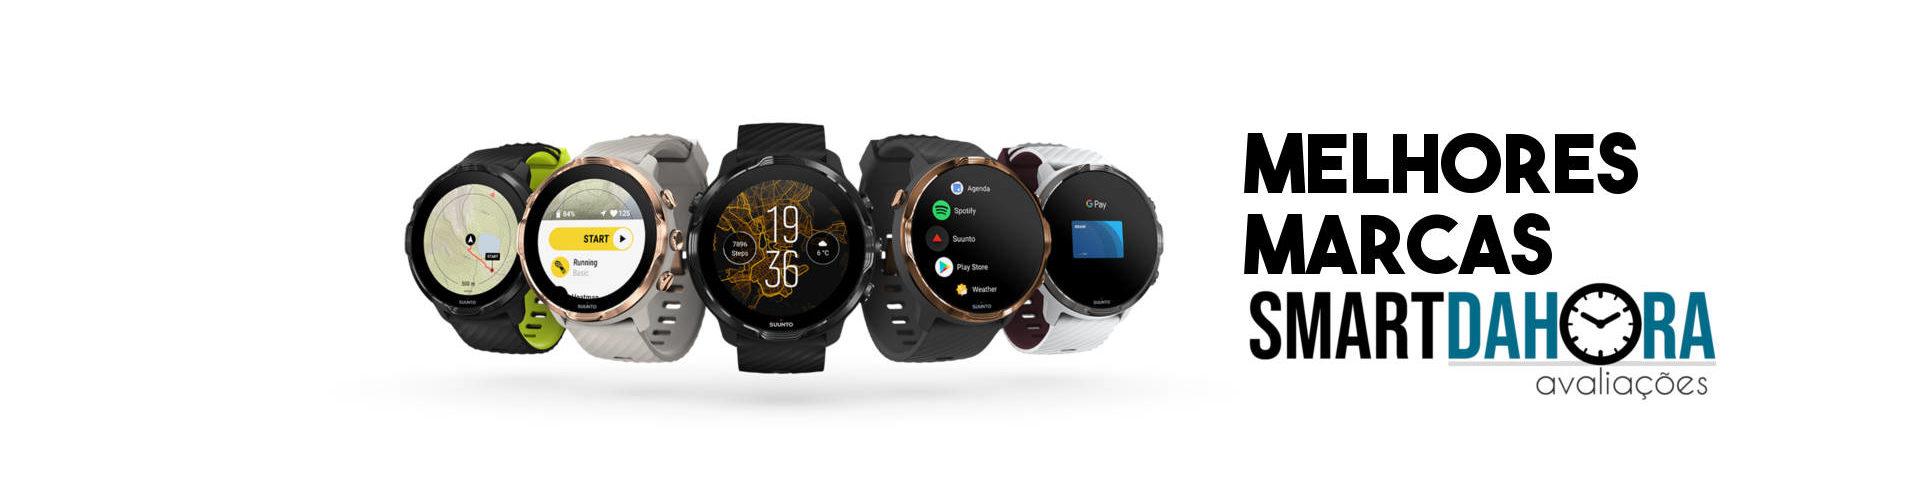 marcas smartwatch